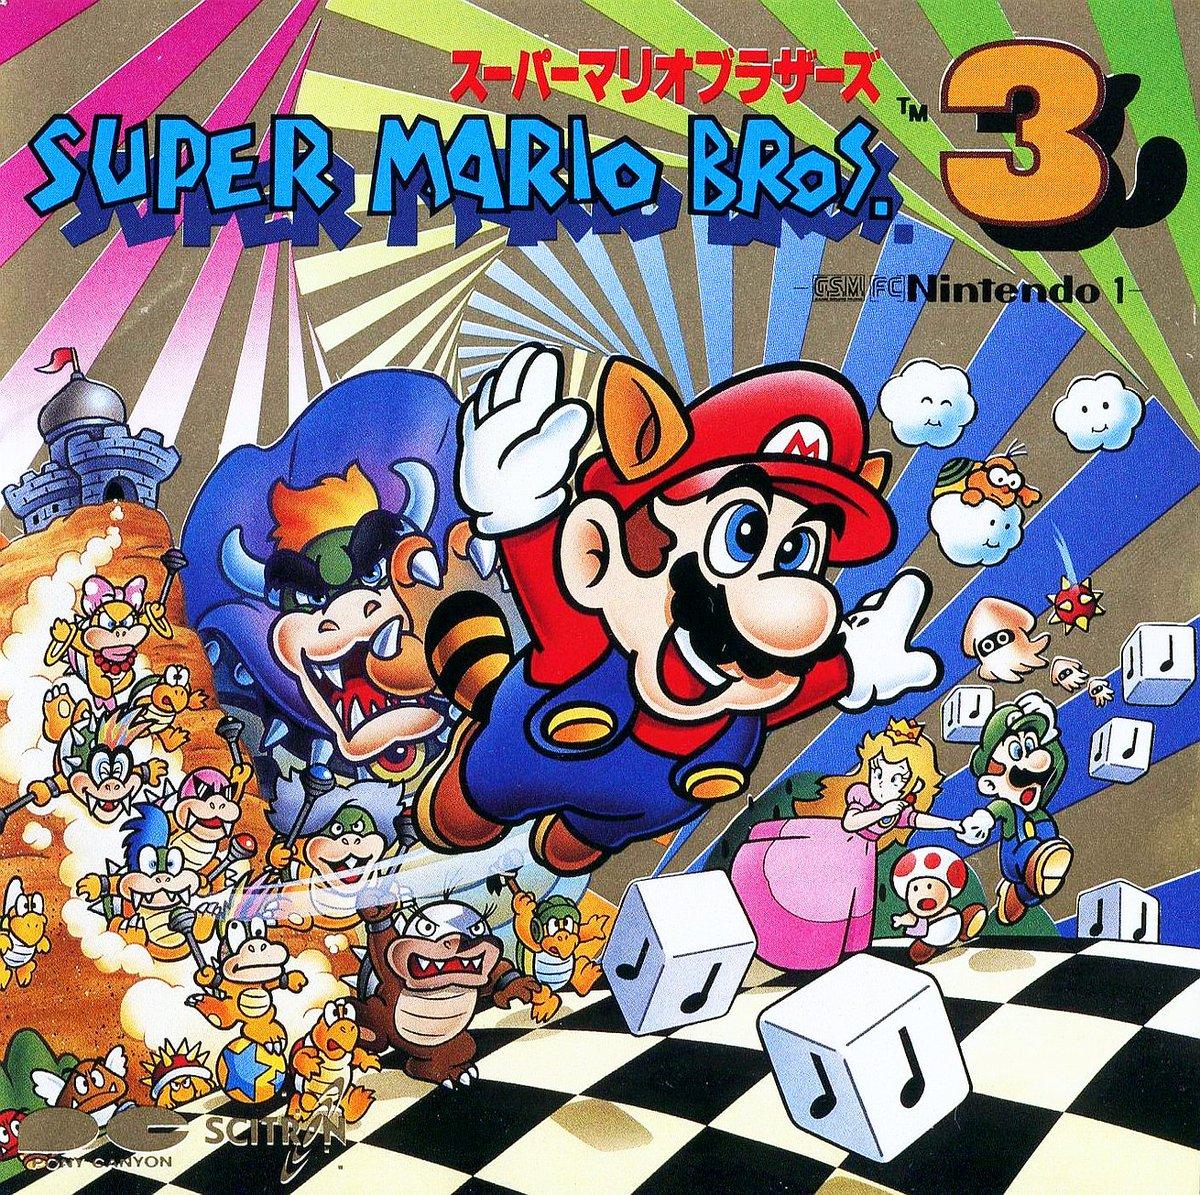 Cool Box Art On Twitter Super Mario Bros 3 G S M Nintendo 1